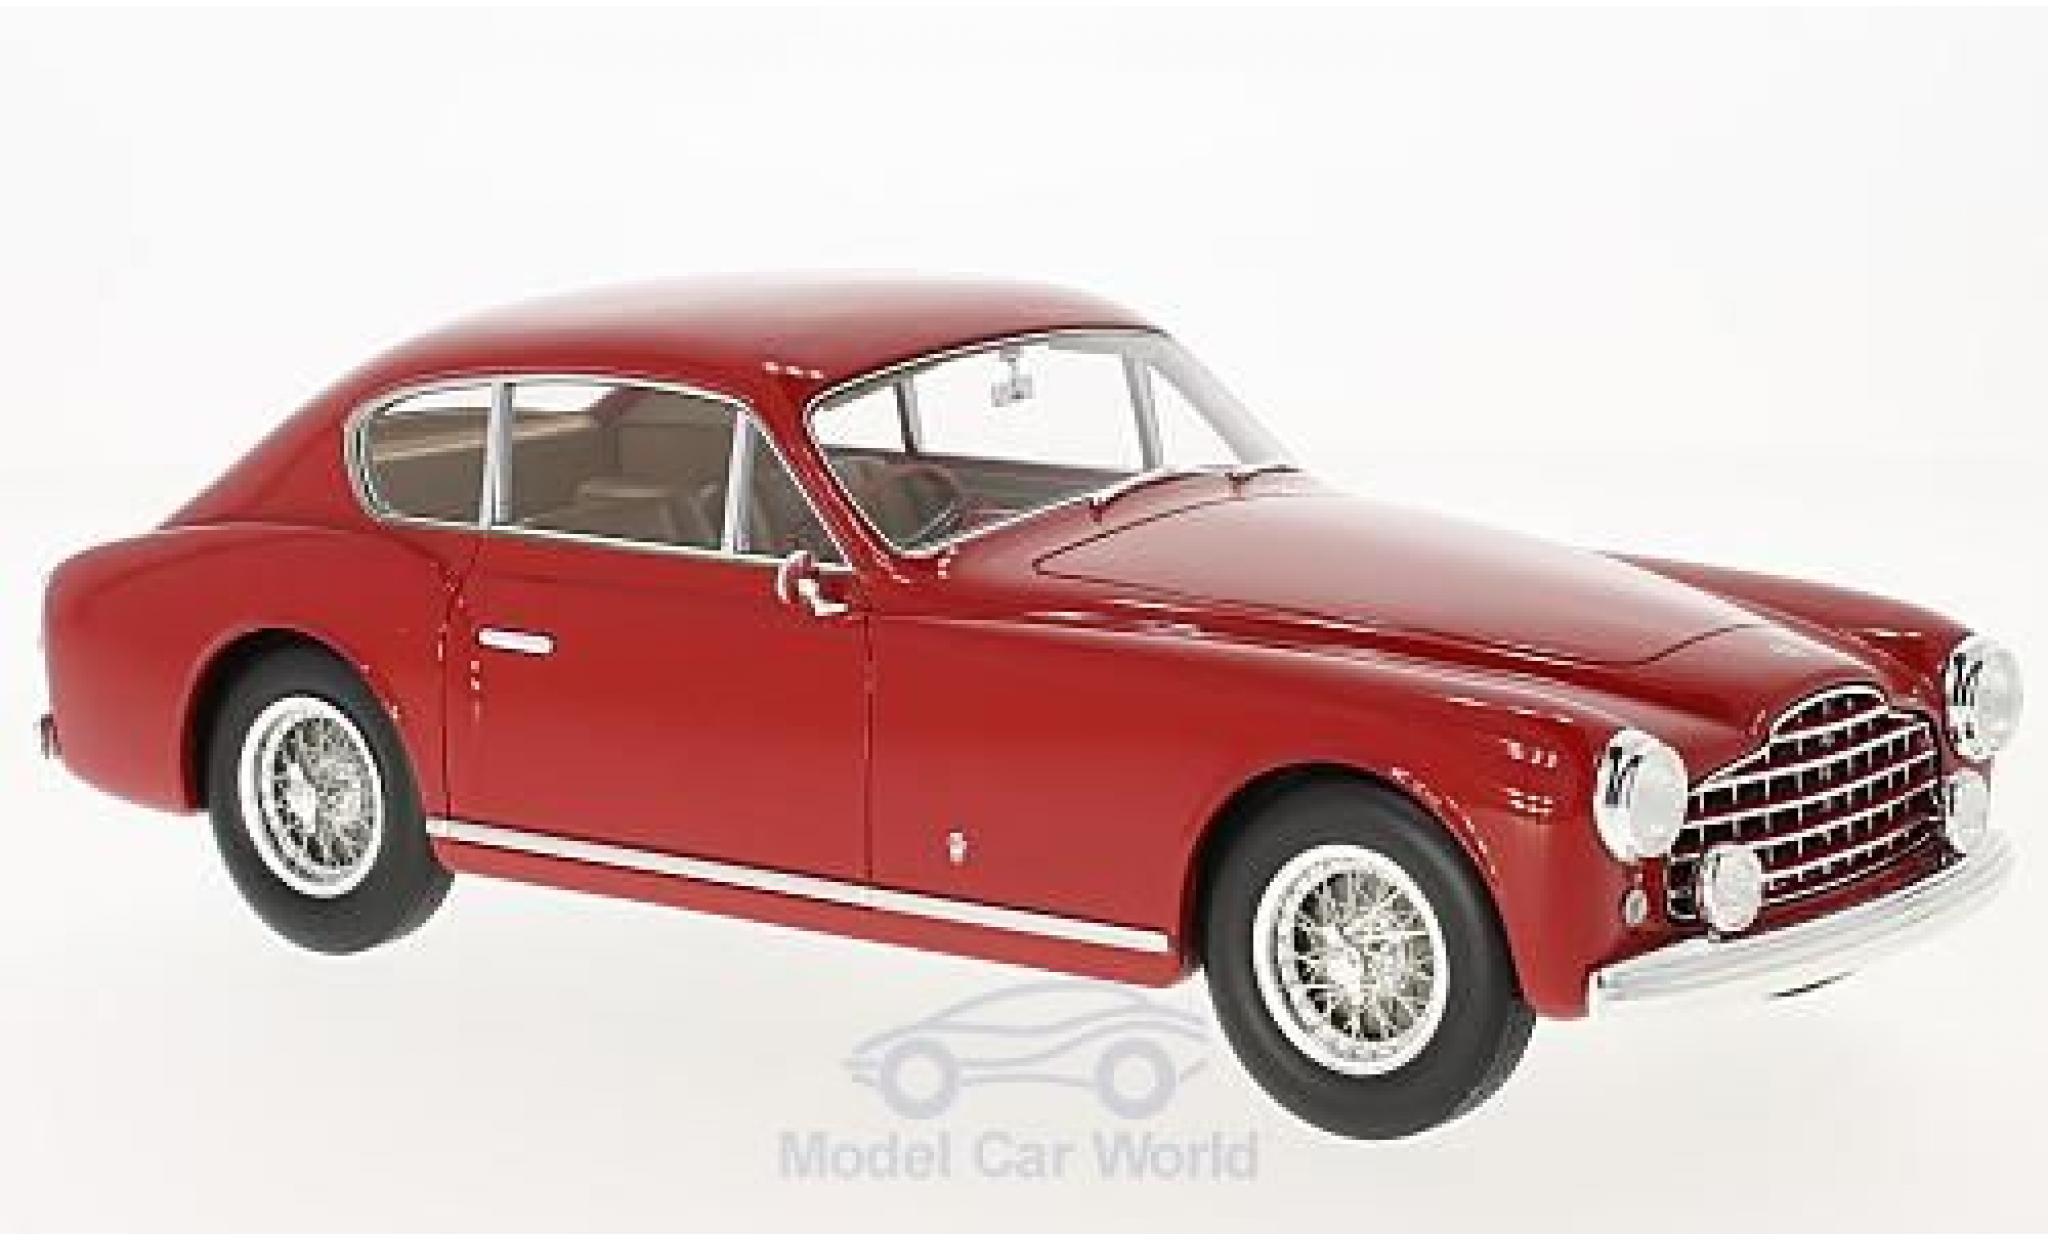 Ferrari 195 1/18 BoS Models Inter Ghia rot RHD 0